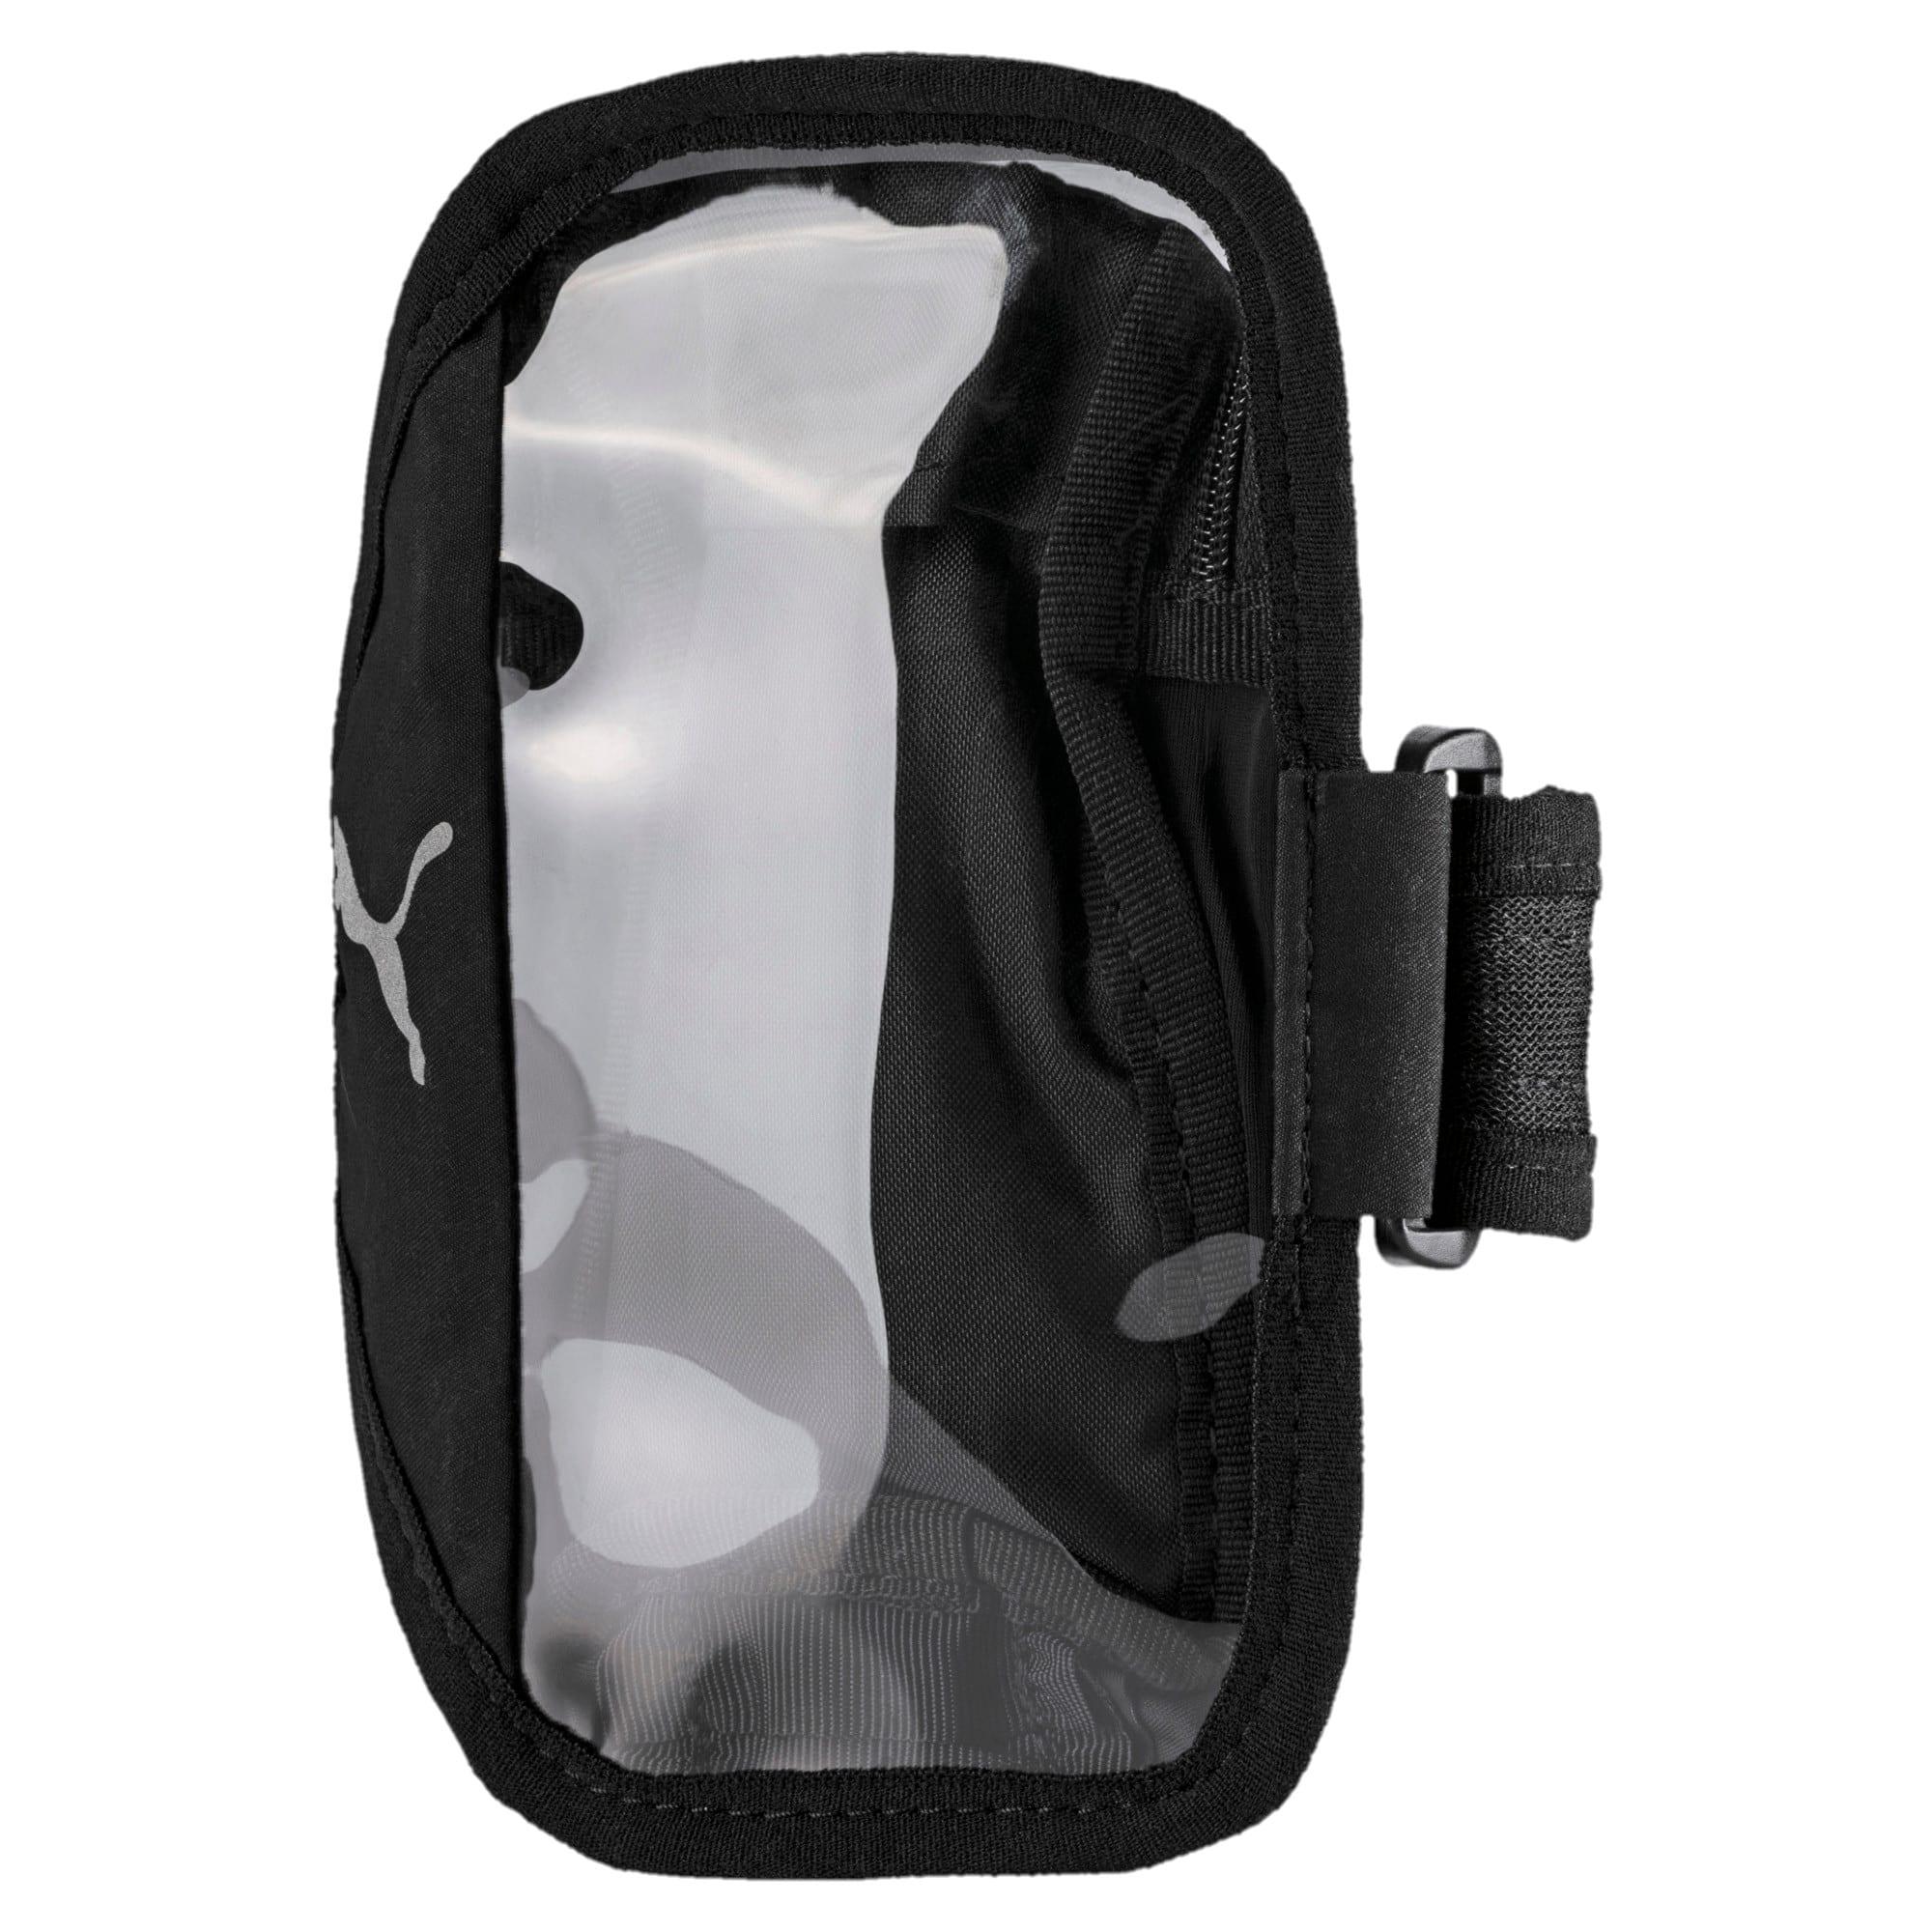 Thumbnail 1 of Running Mobile Armband, Puma Black-Periscope, medium-IND